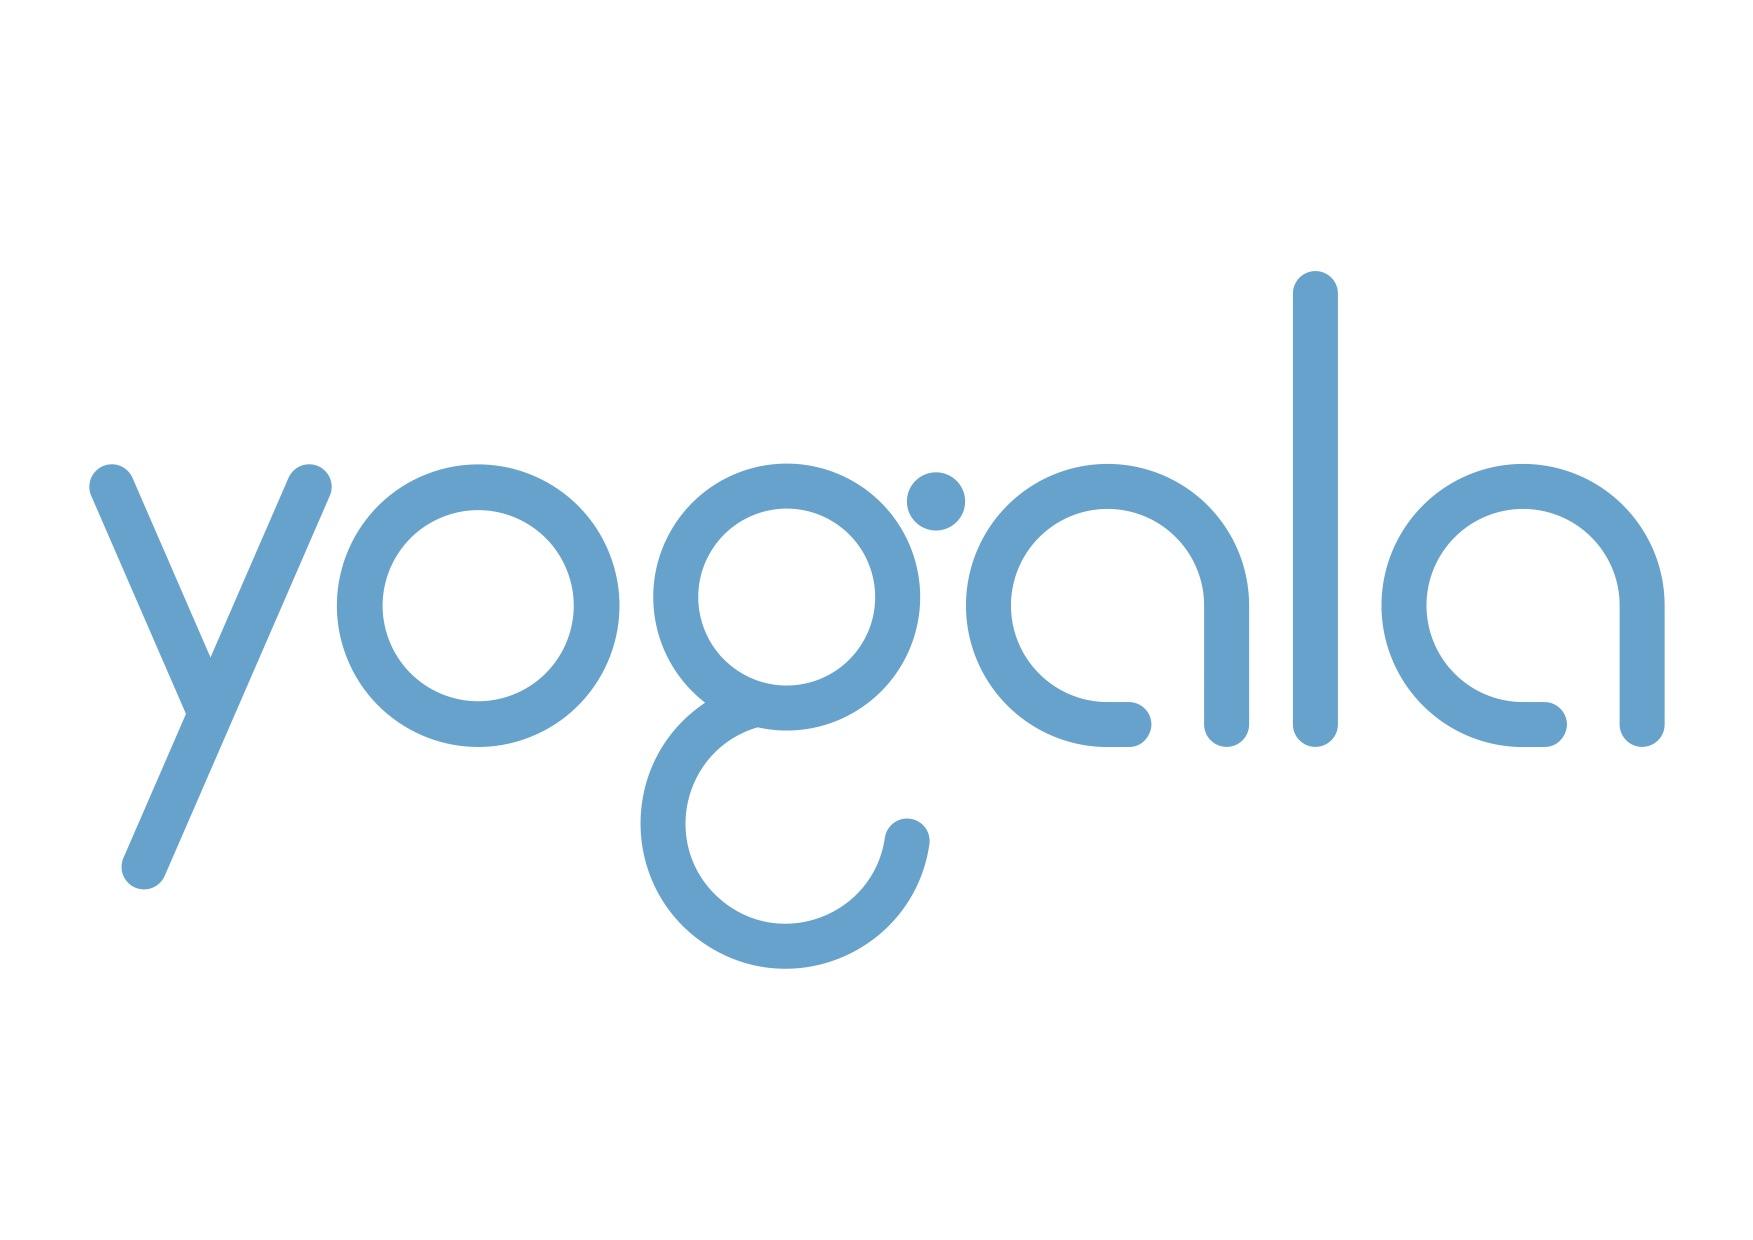 Yogala logo.jpg